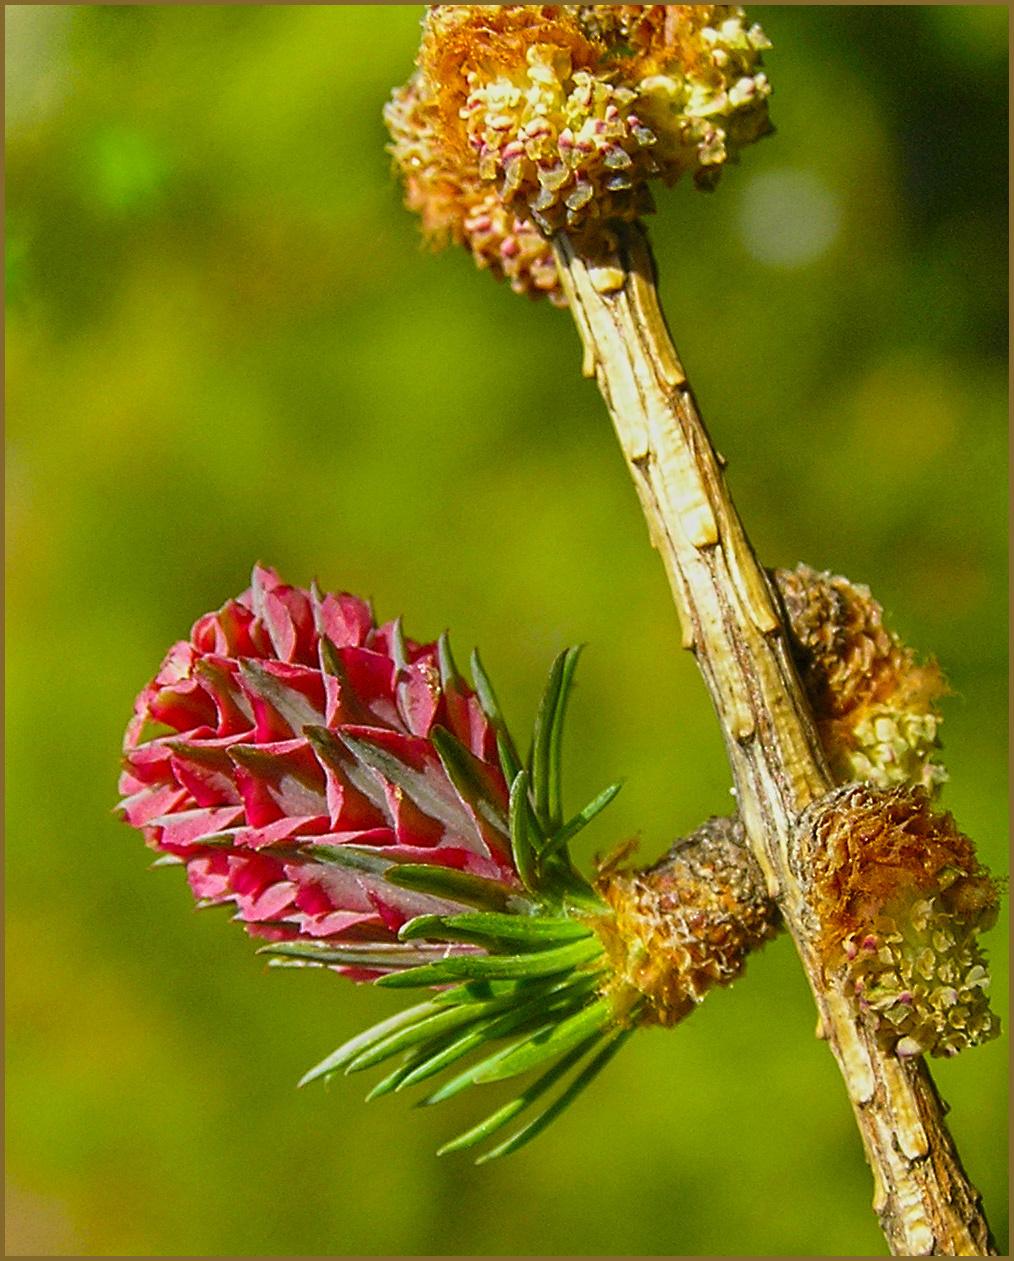 vörösfenyő virága